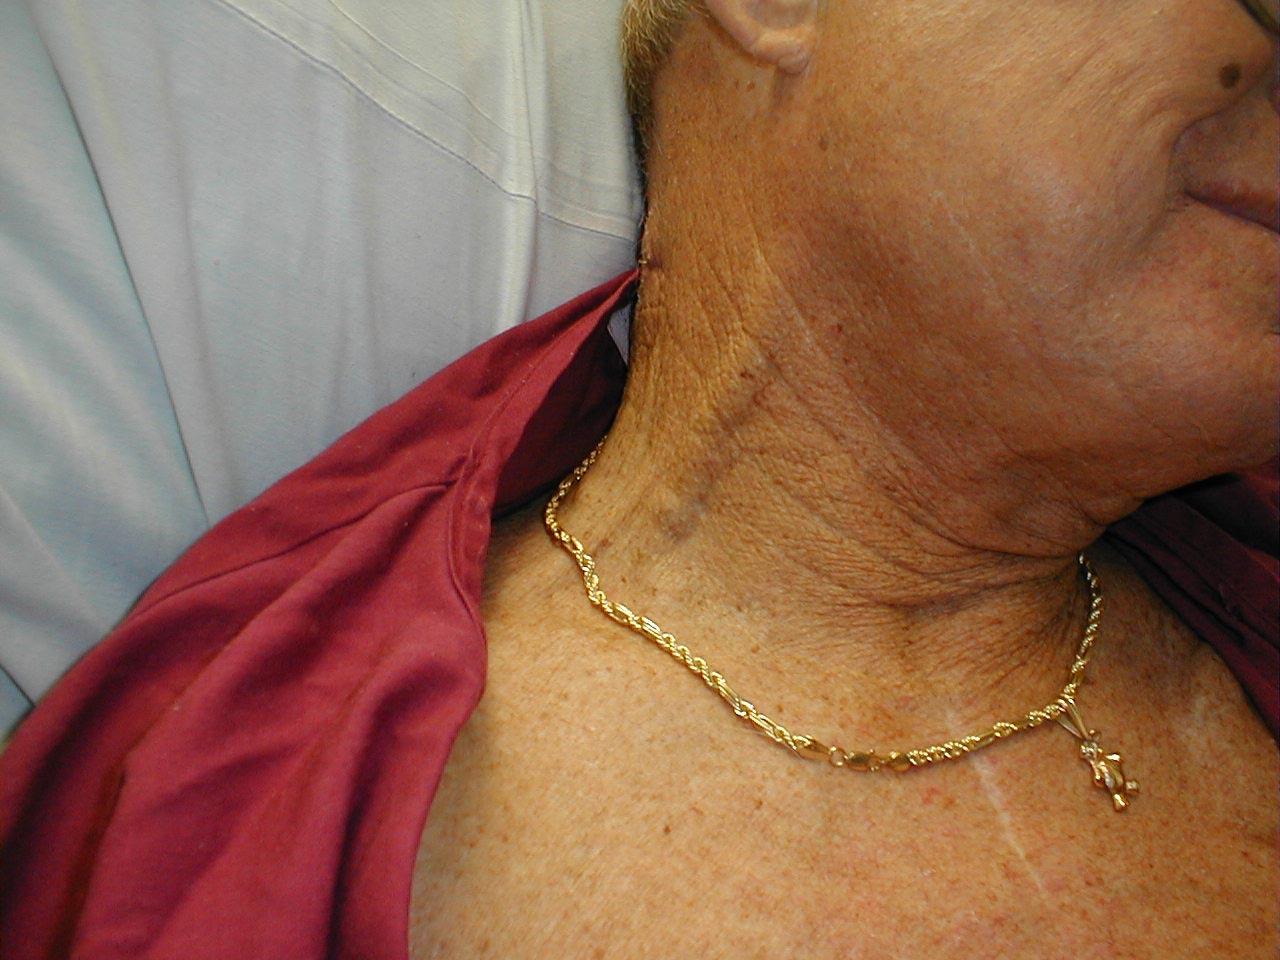 Doctors Gates: External Jugular Vein Distention